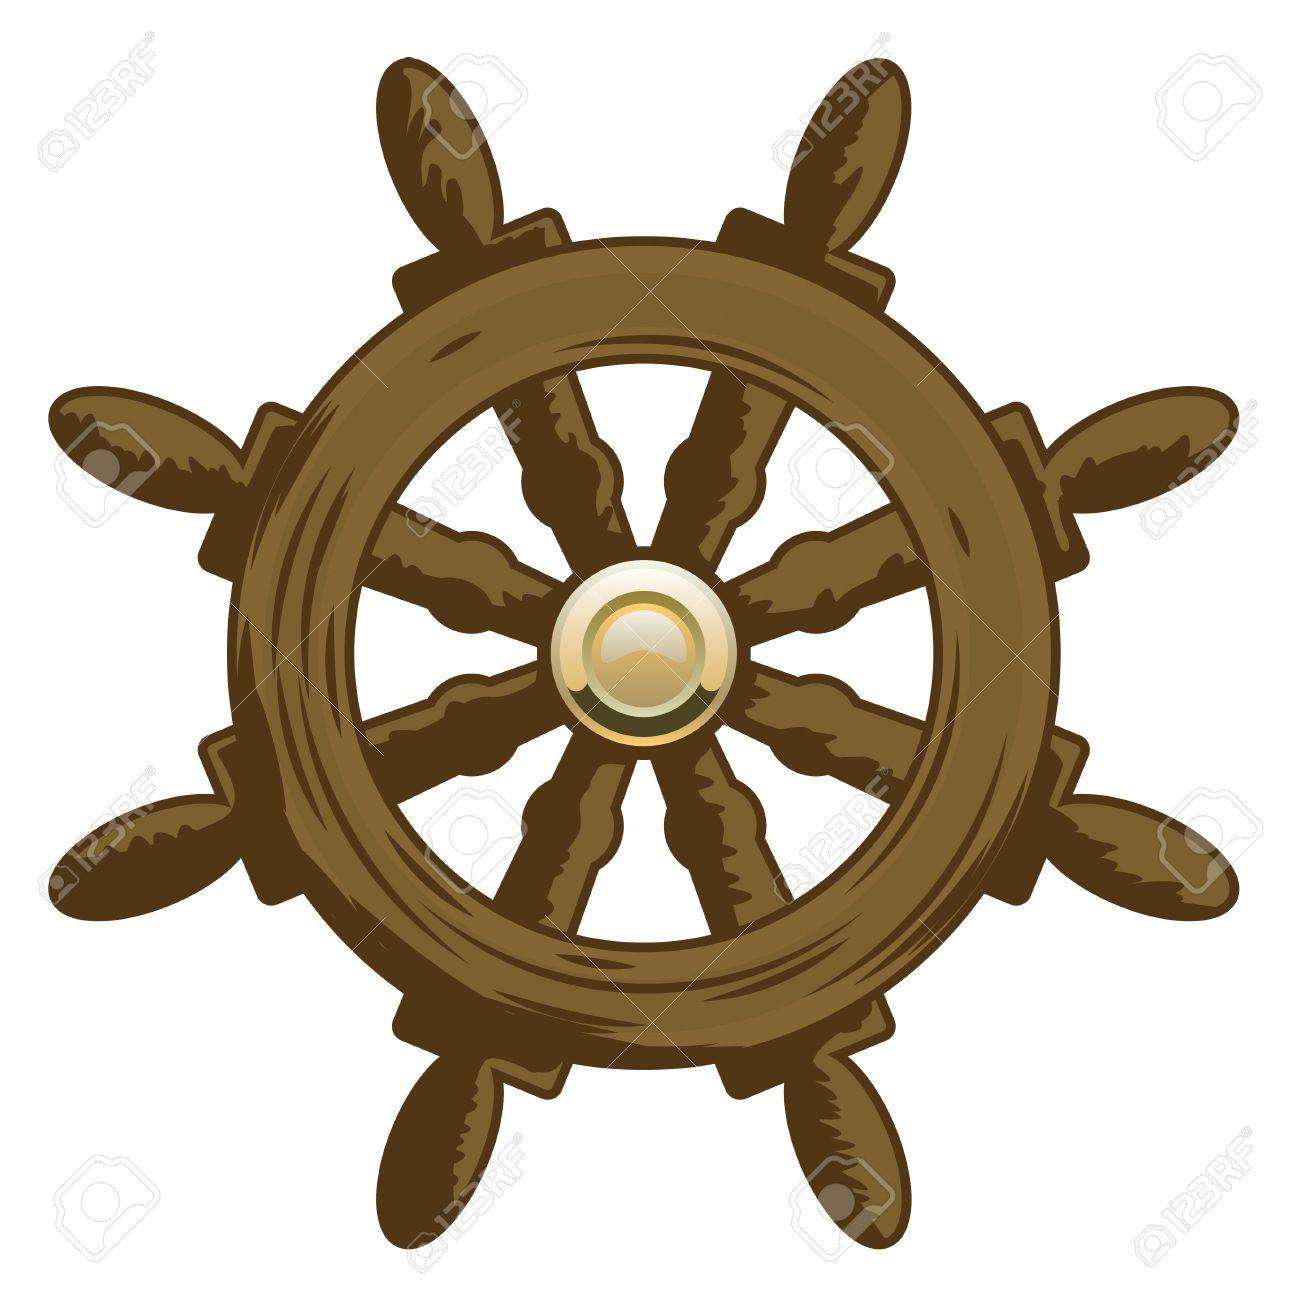 1300x1300 Ship Wheel Clipart